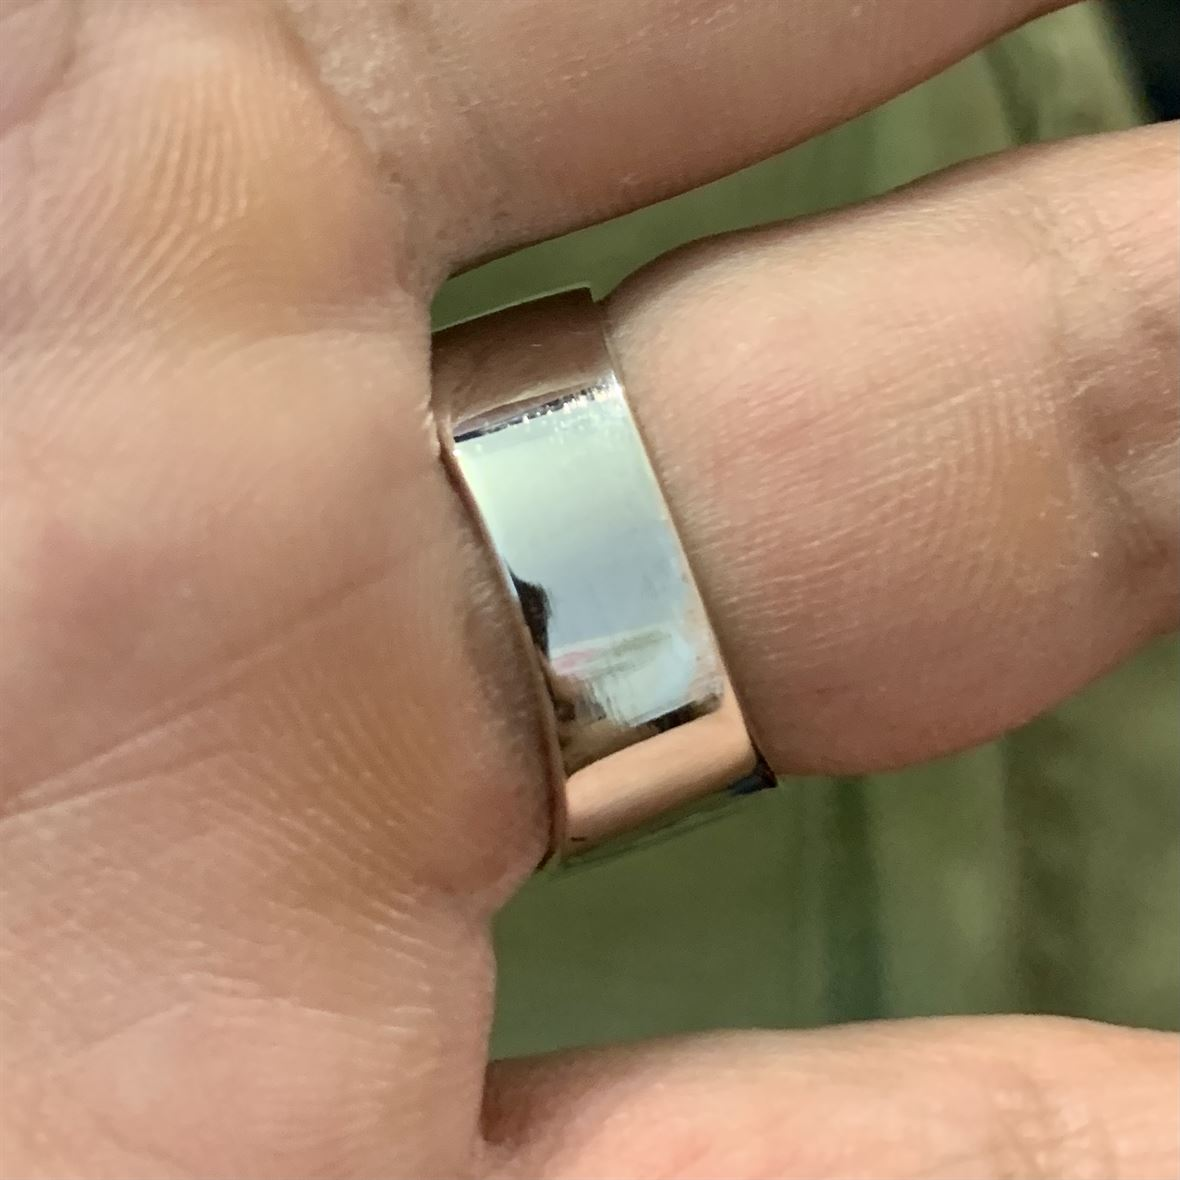 Coral Marjaan Ring 925 Silver in Pakistan - Marjan stone